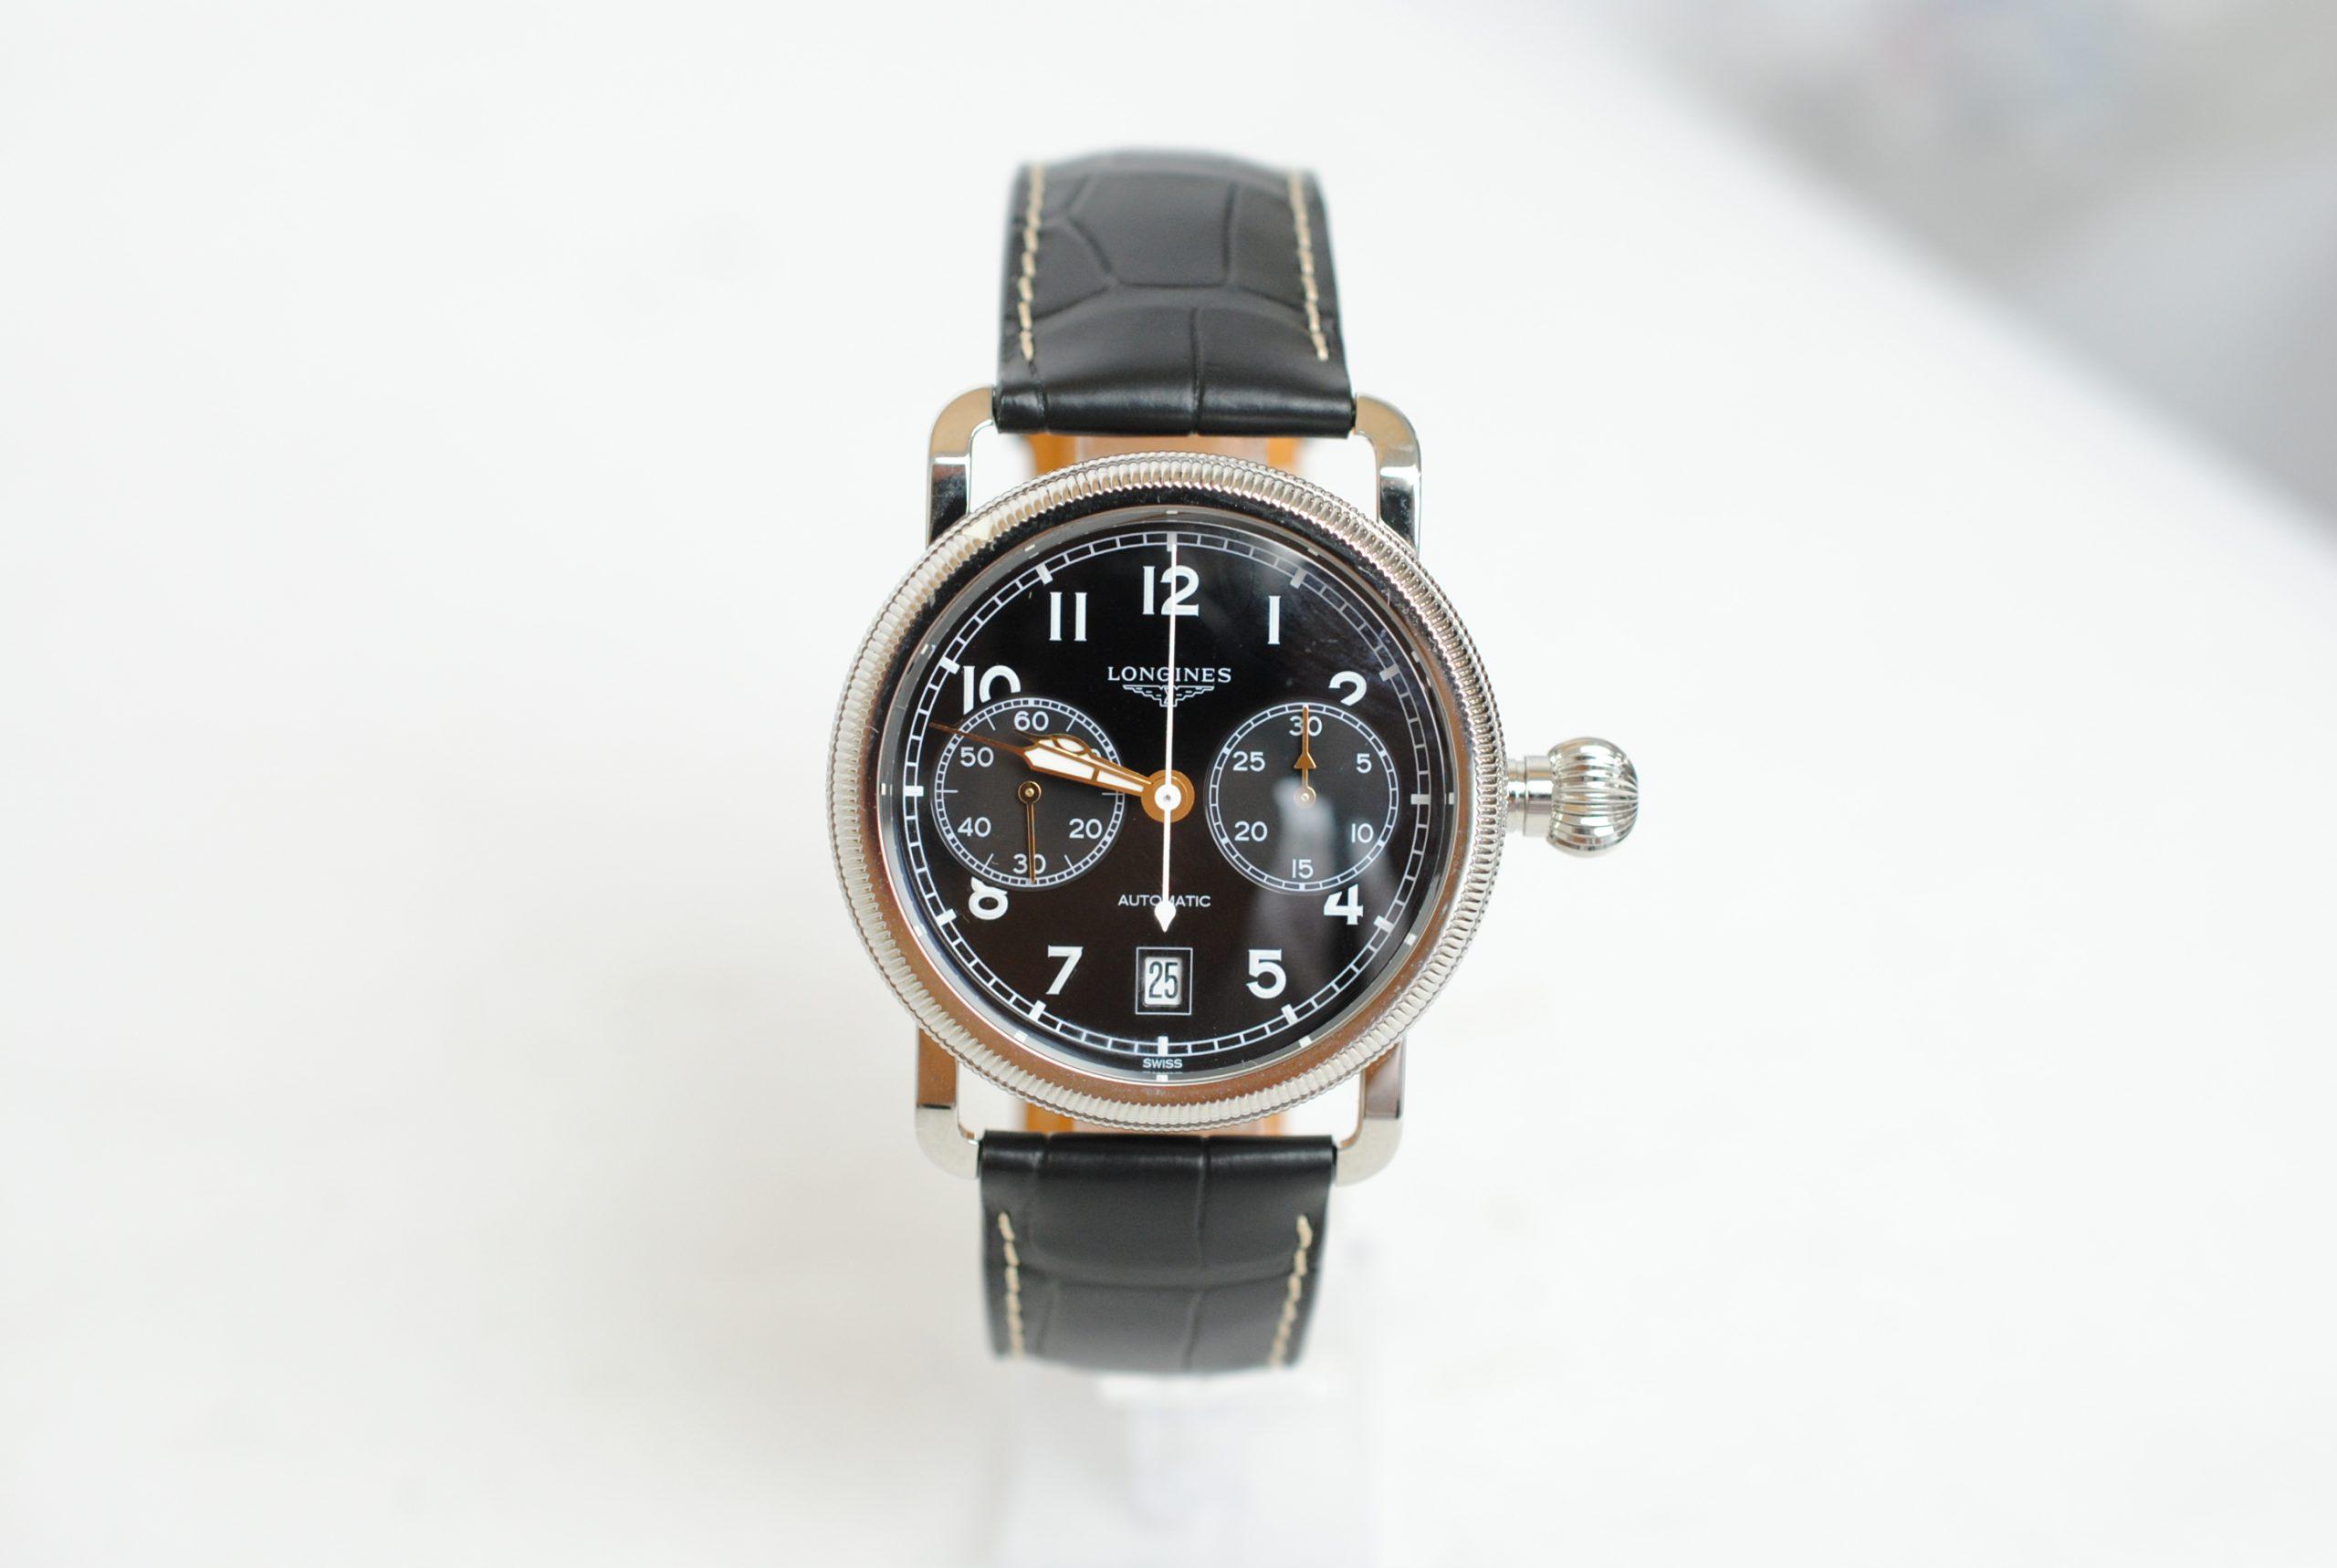 Longinesの機械式時計